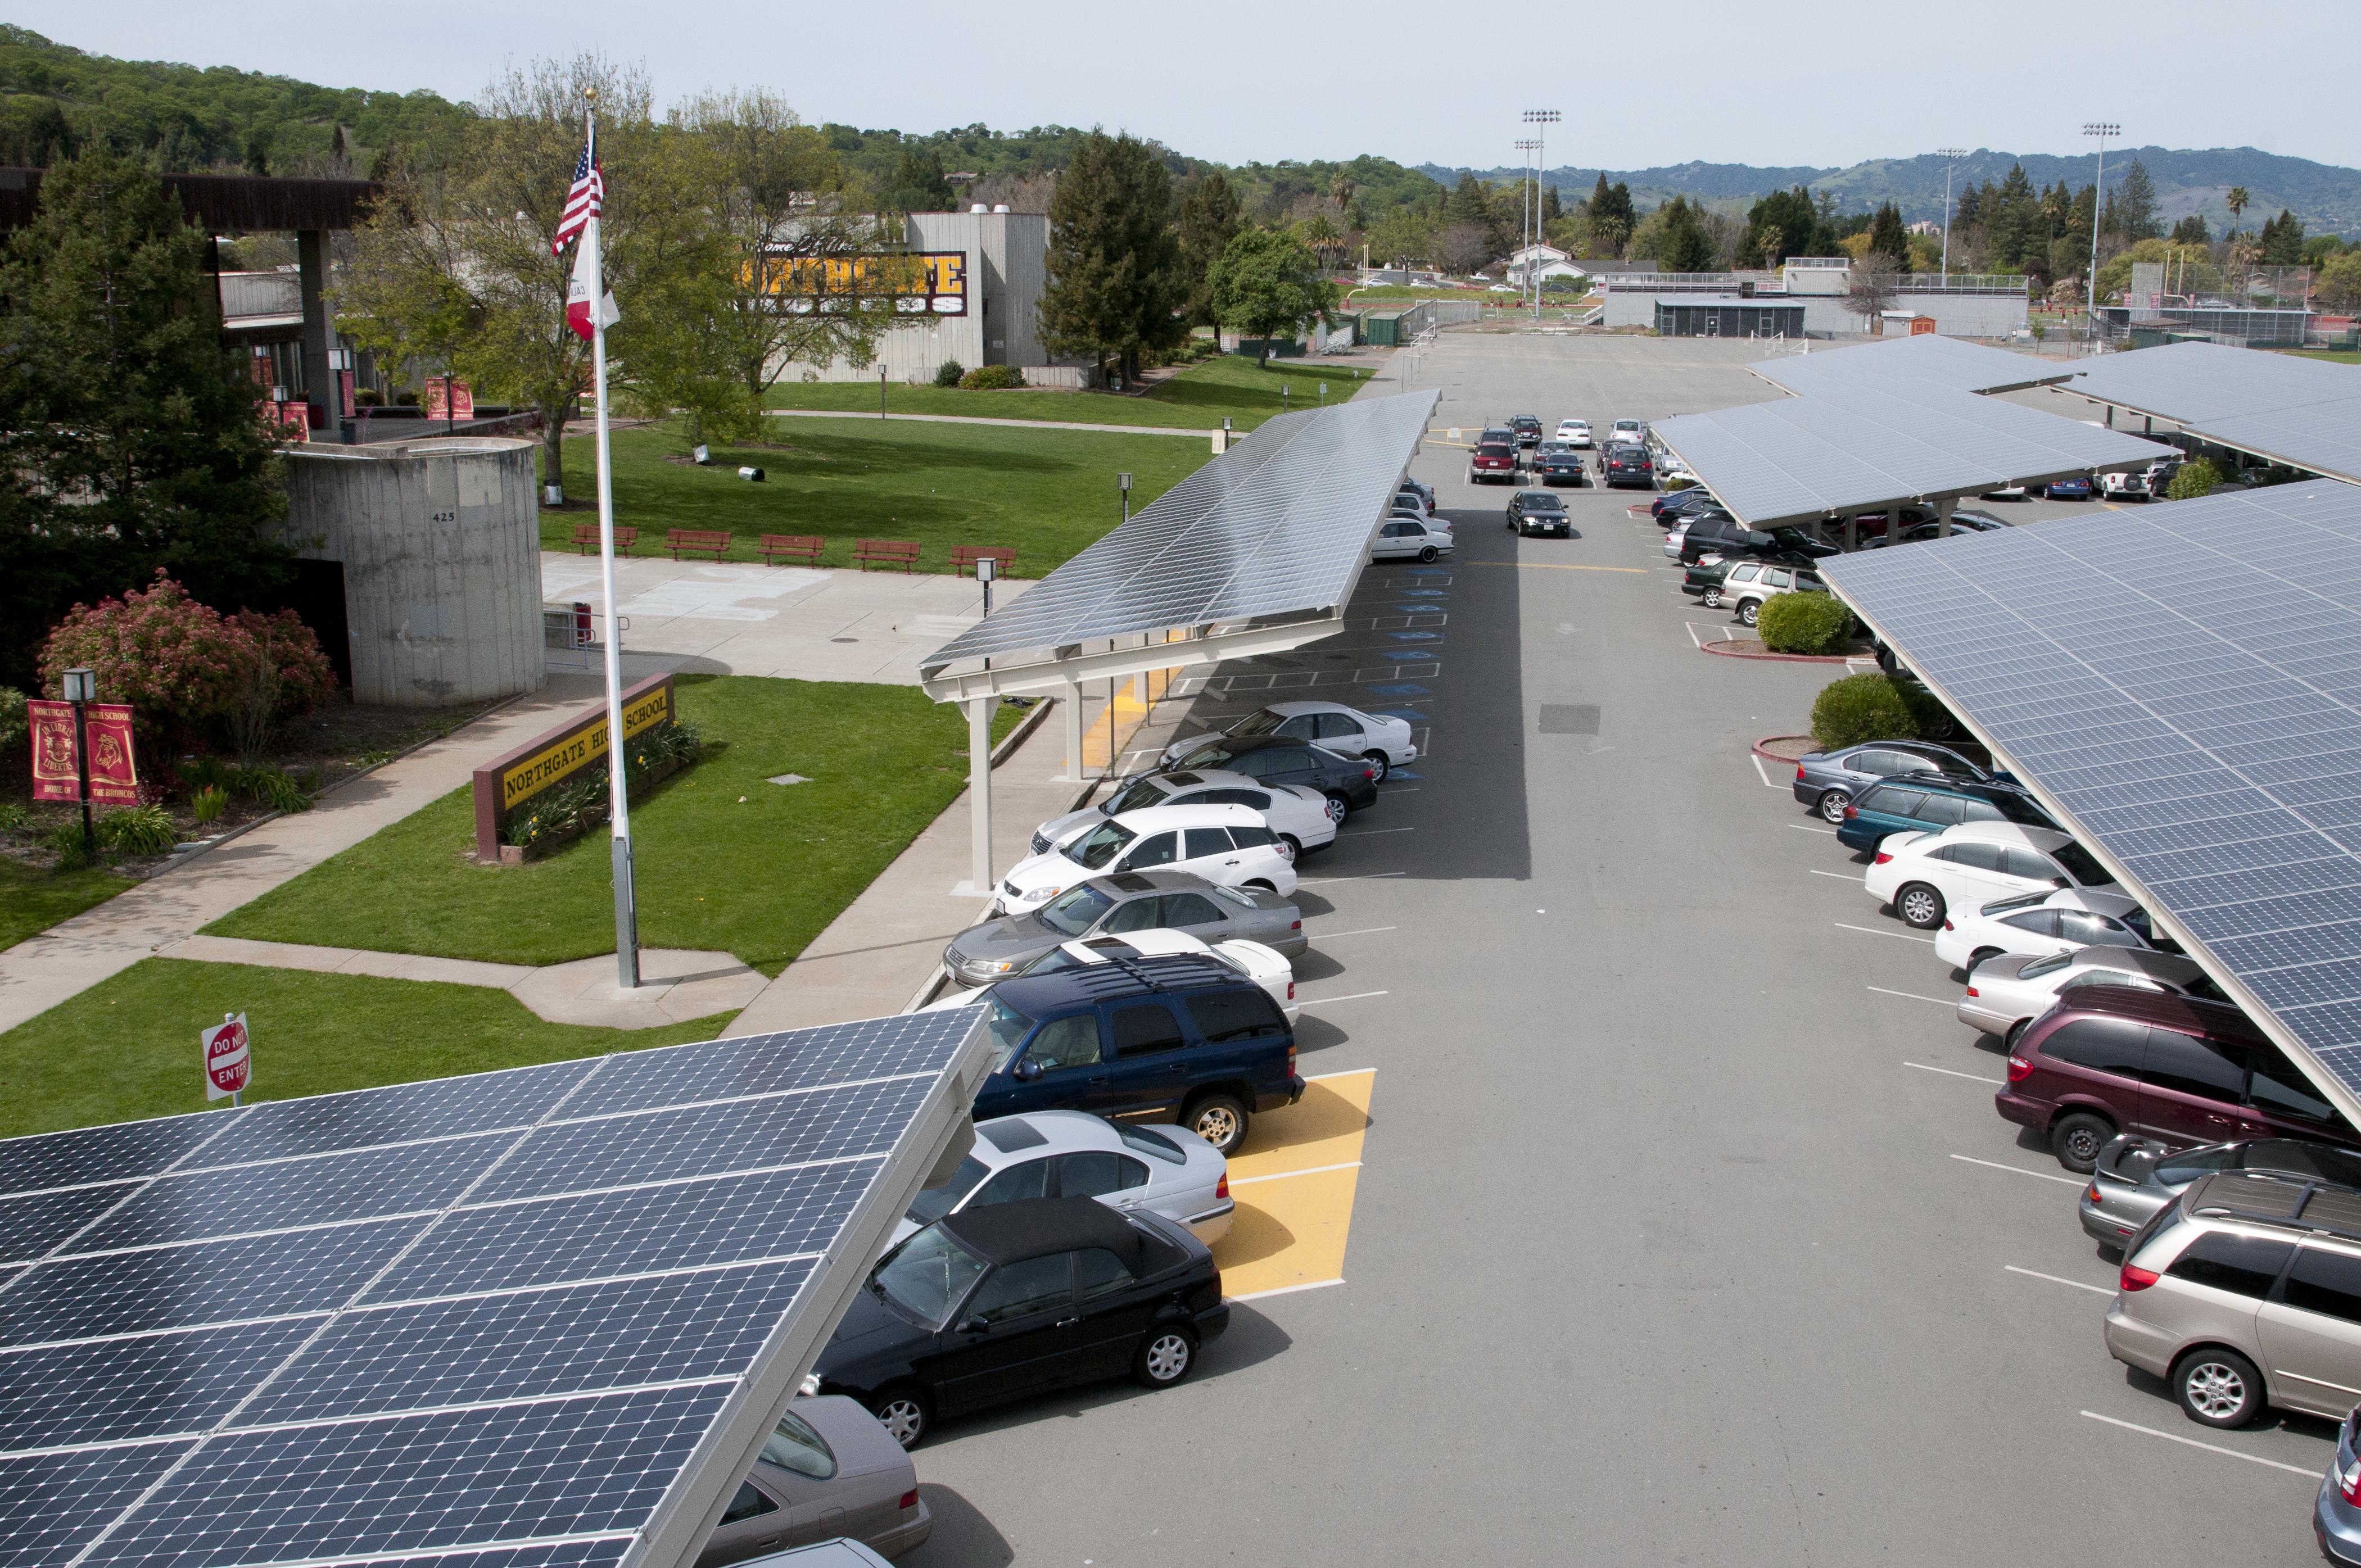 Solar carport with cars under it.